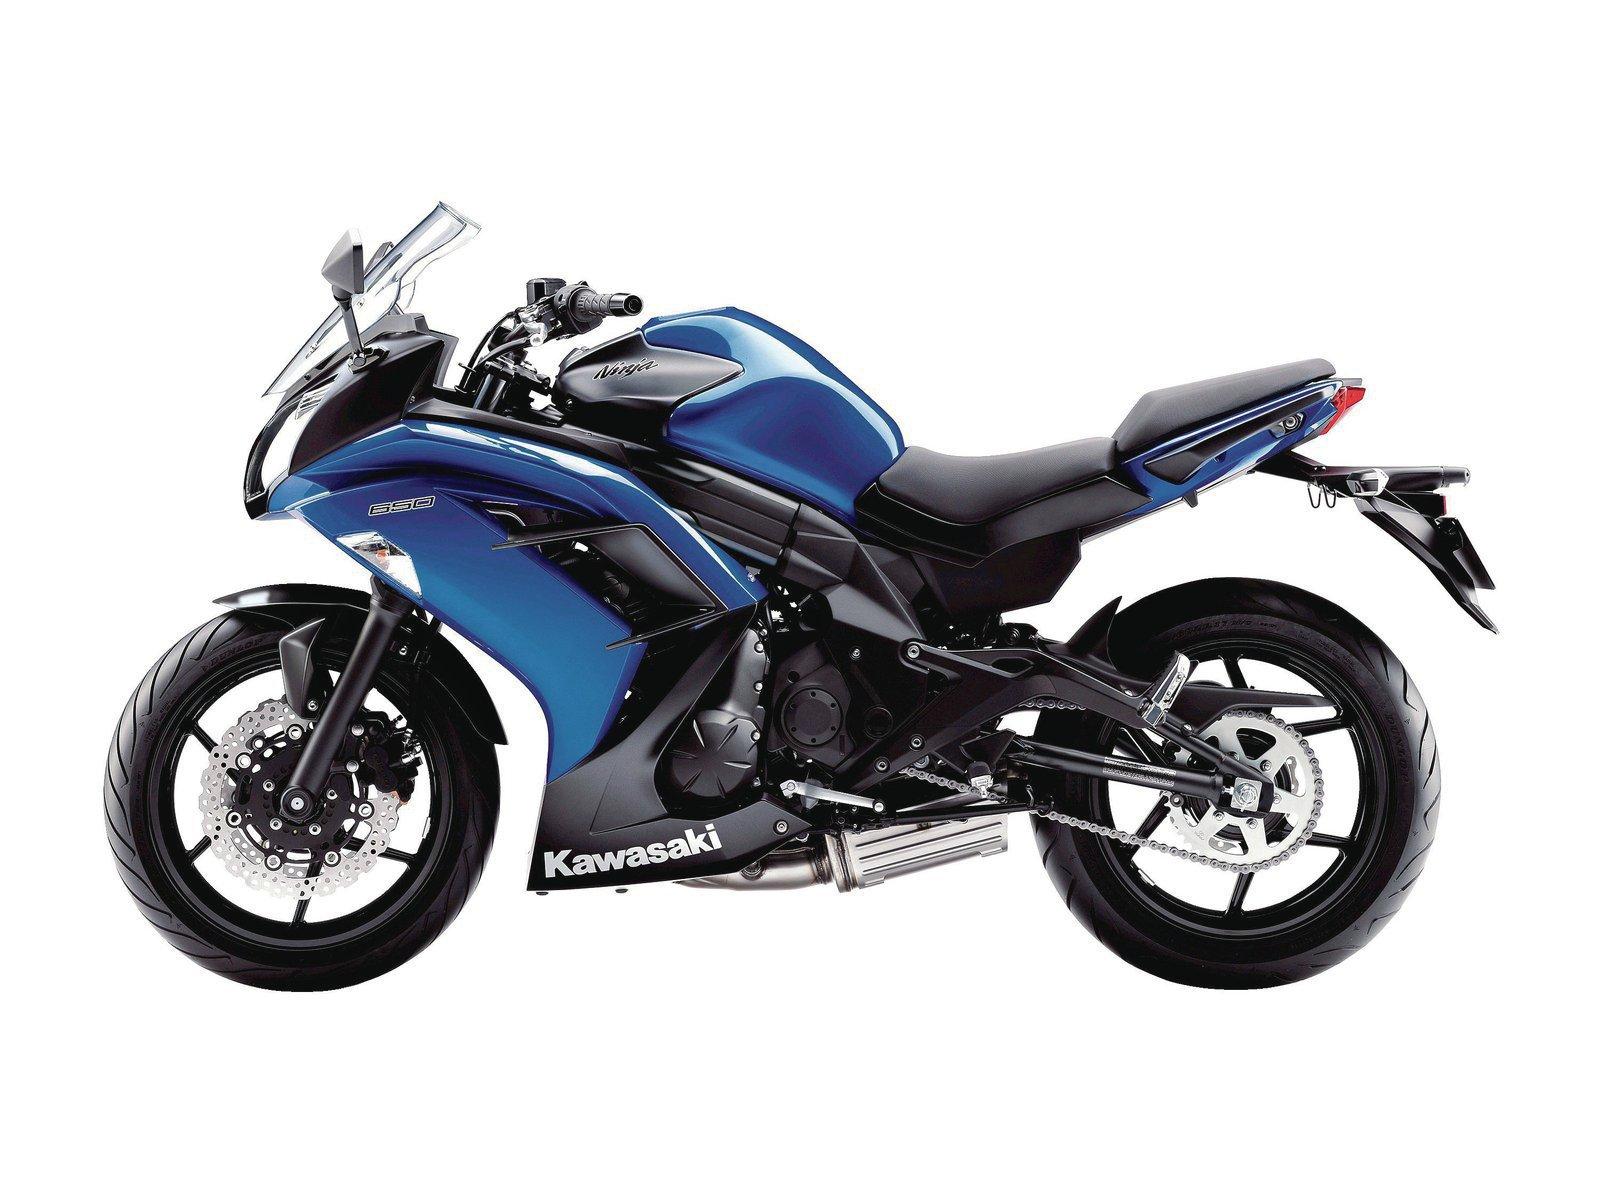 kawasaki motor bikes 2013 kawasaki ninja 650. Black Bedroom Furniture Sets. Home Design Ideas